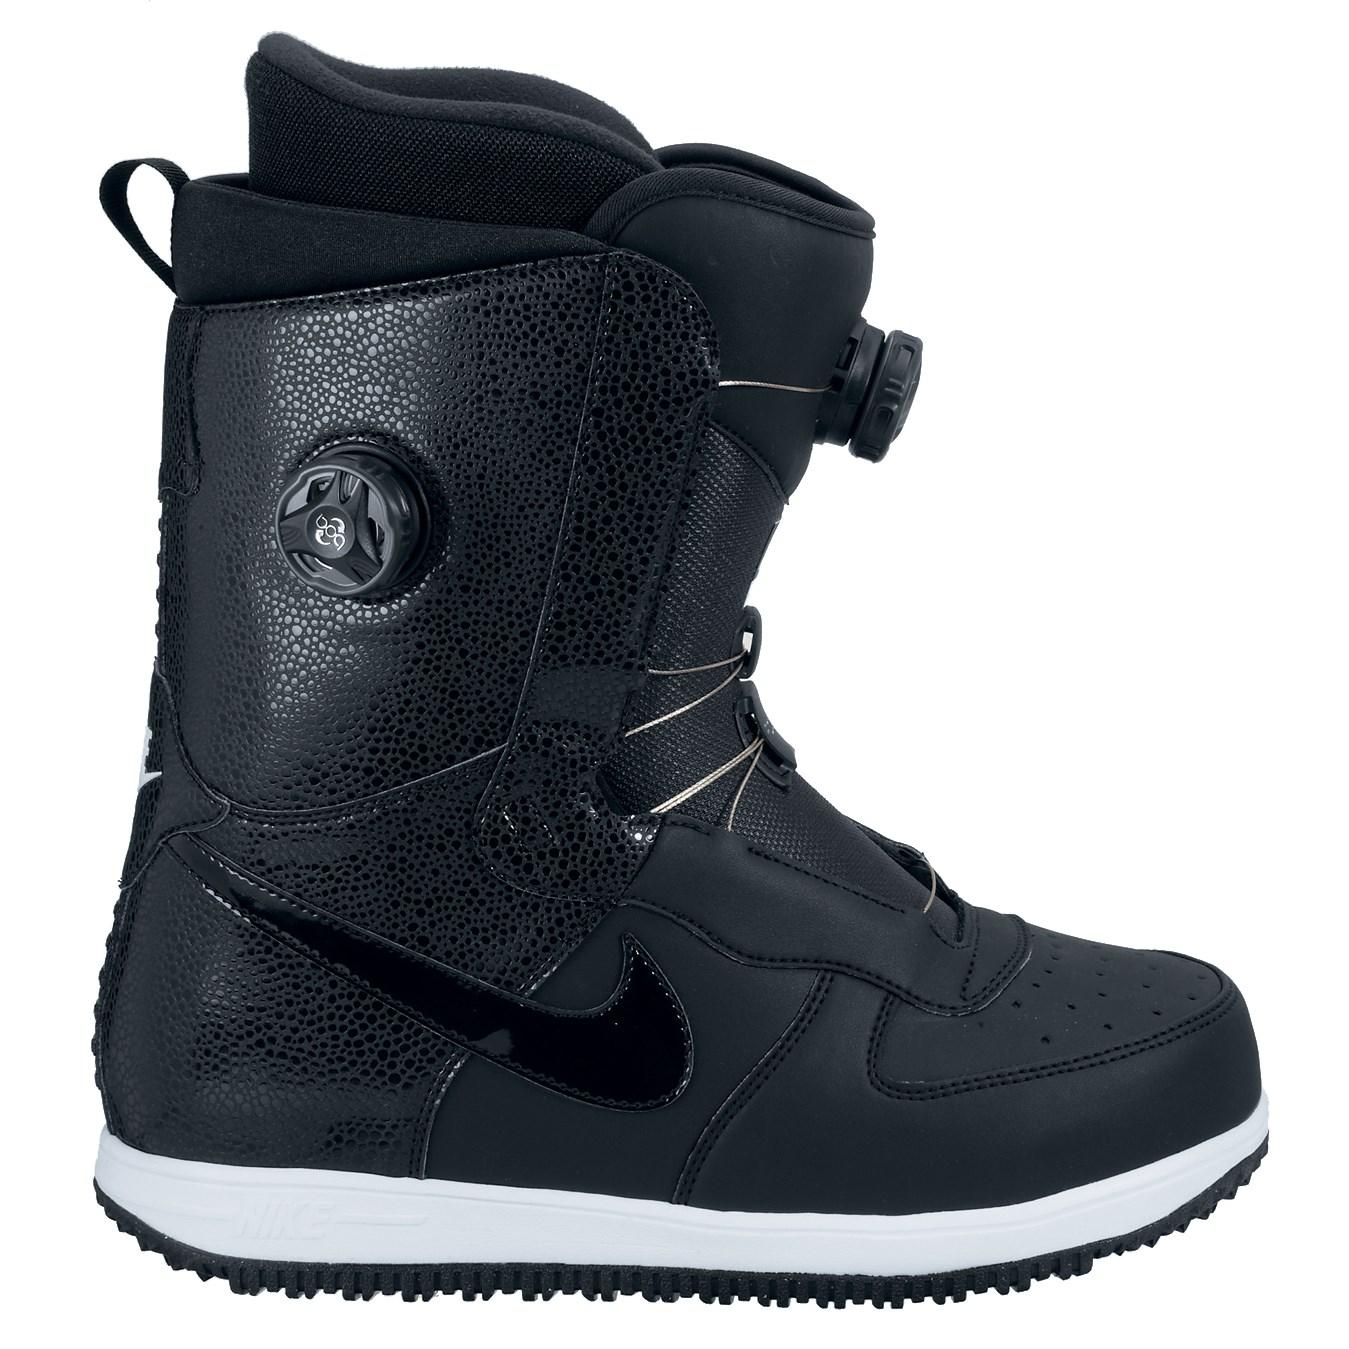 18050e083db Nike SB Zoom Force 1 Boa Snowboard Boots 2014